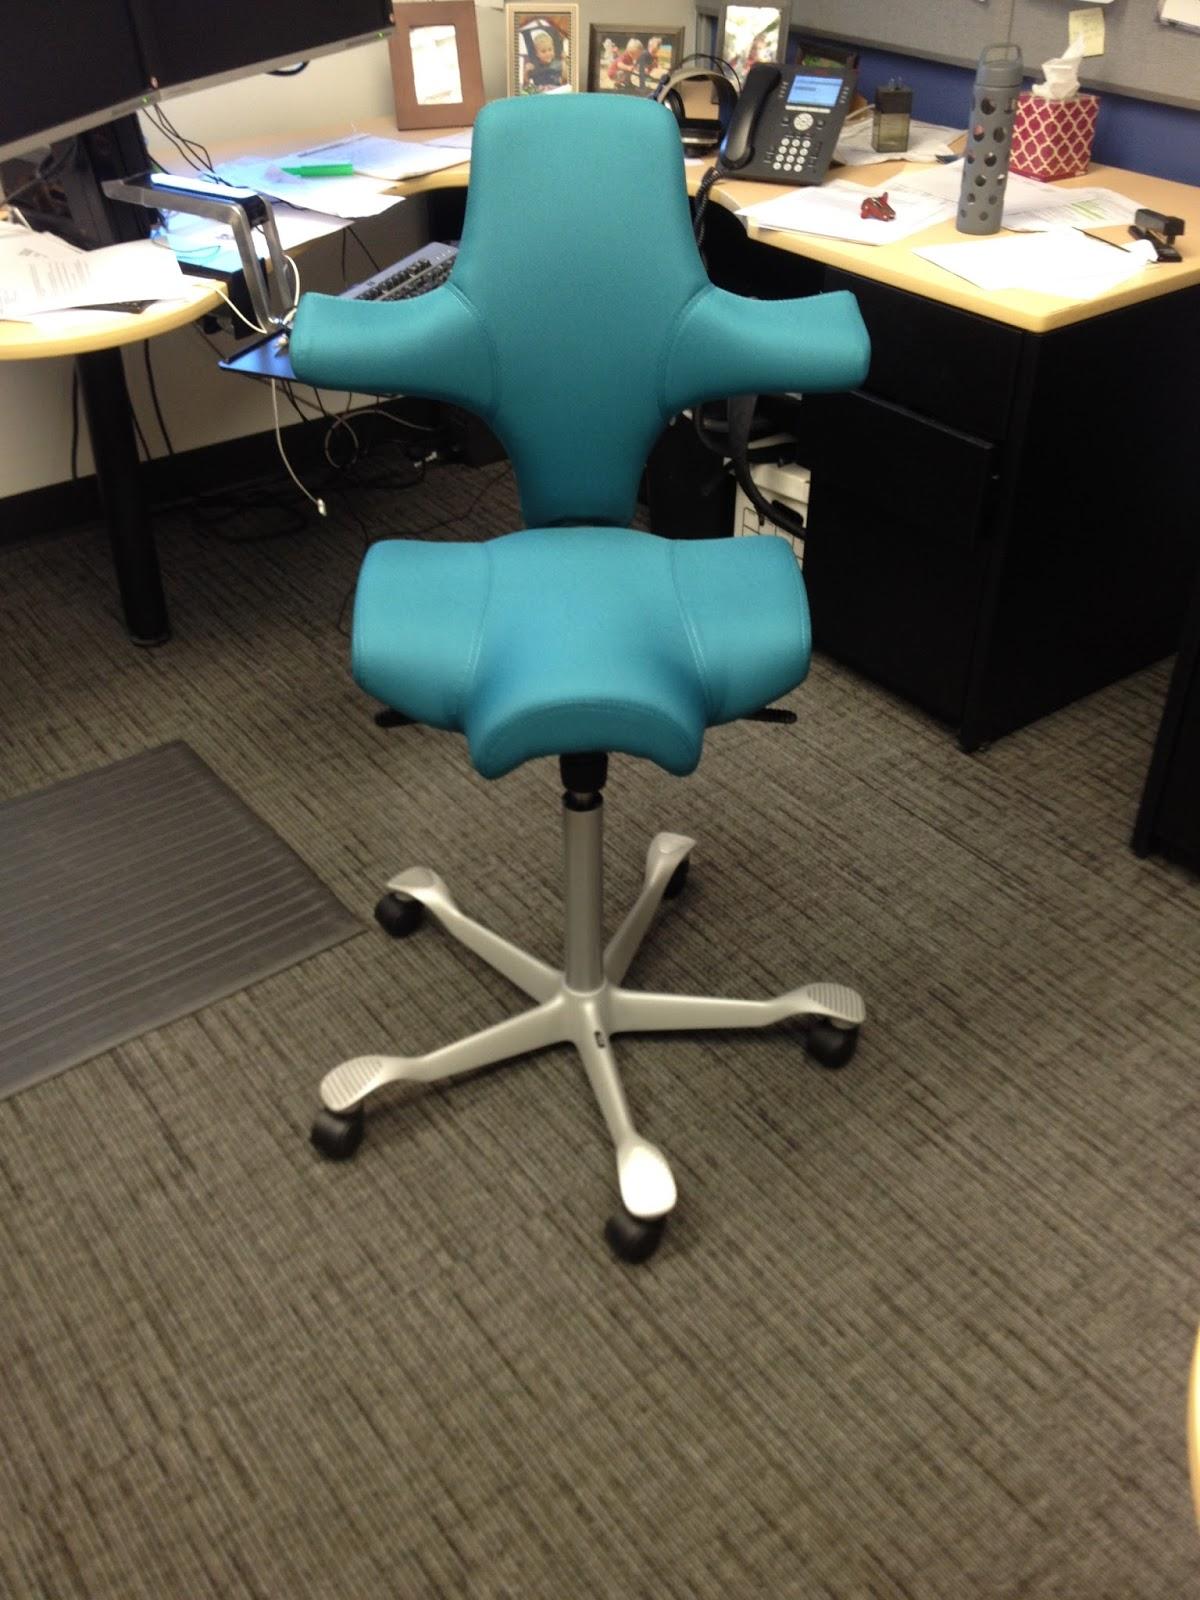 Ergonomic Chair Joe Rogan Black Covers Cheap A Healthy Addiction January 2016